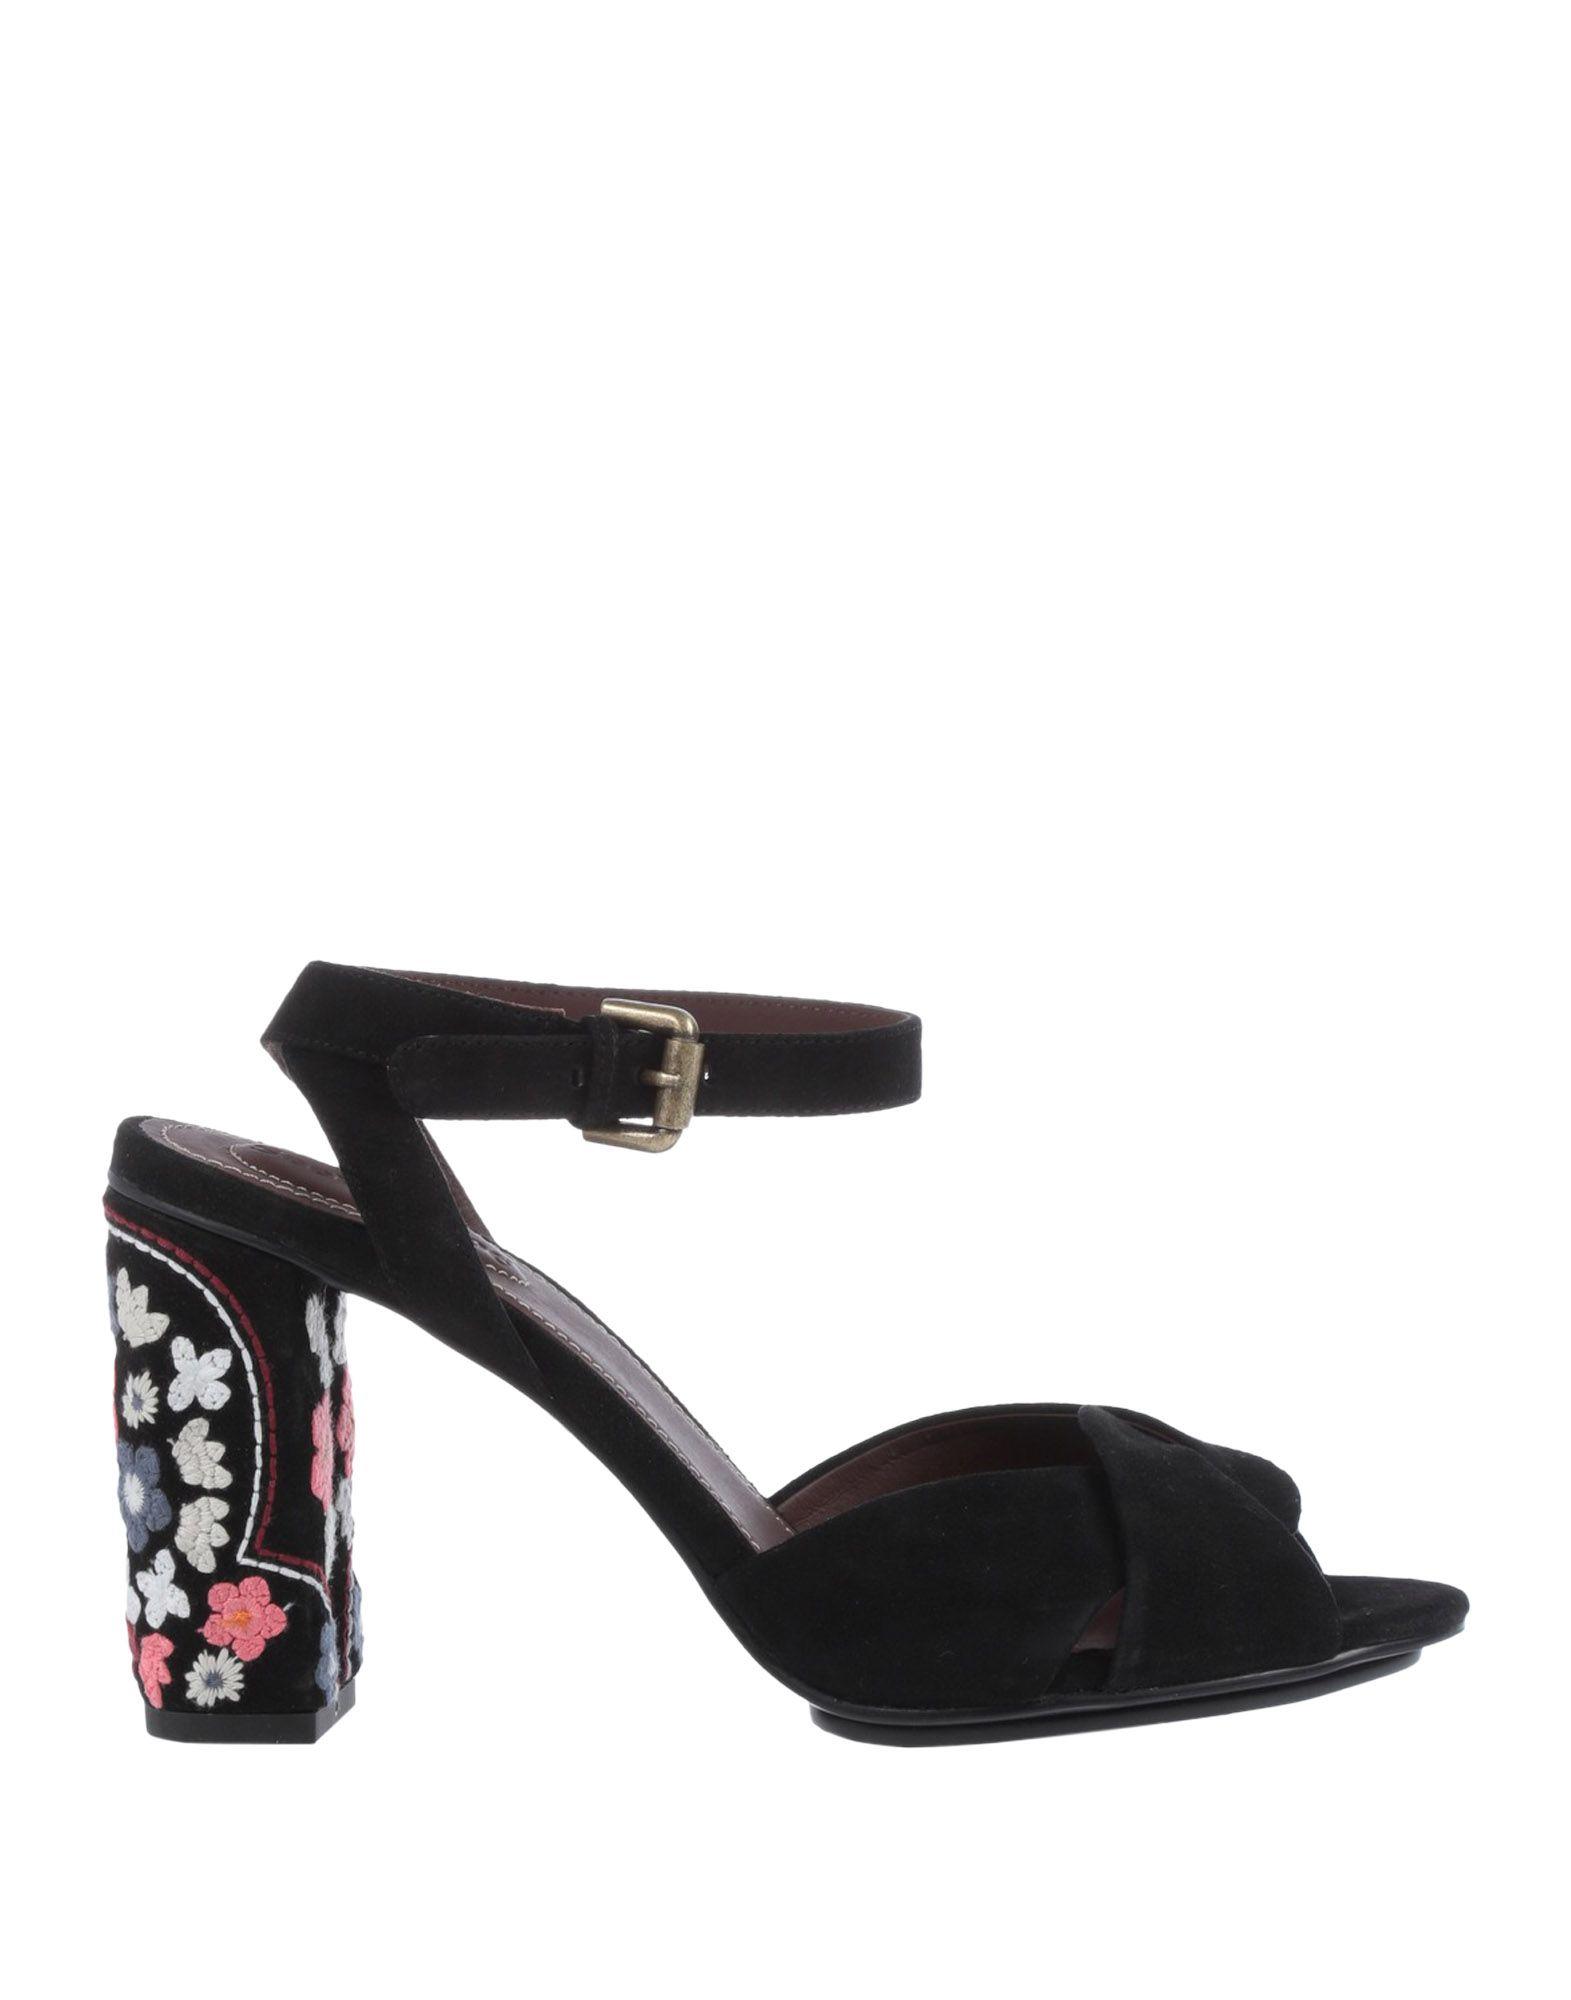 See By Chloé Sandalen Damen  11520778JUGut aussehende strapazierfähige Schuhe